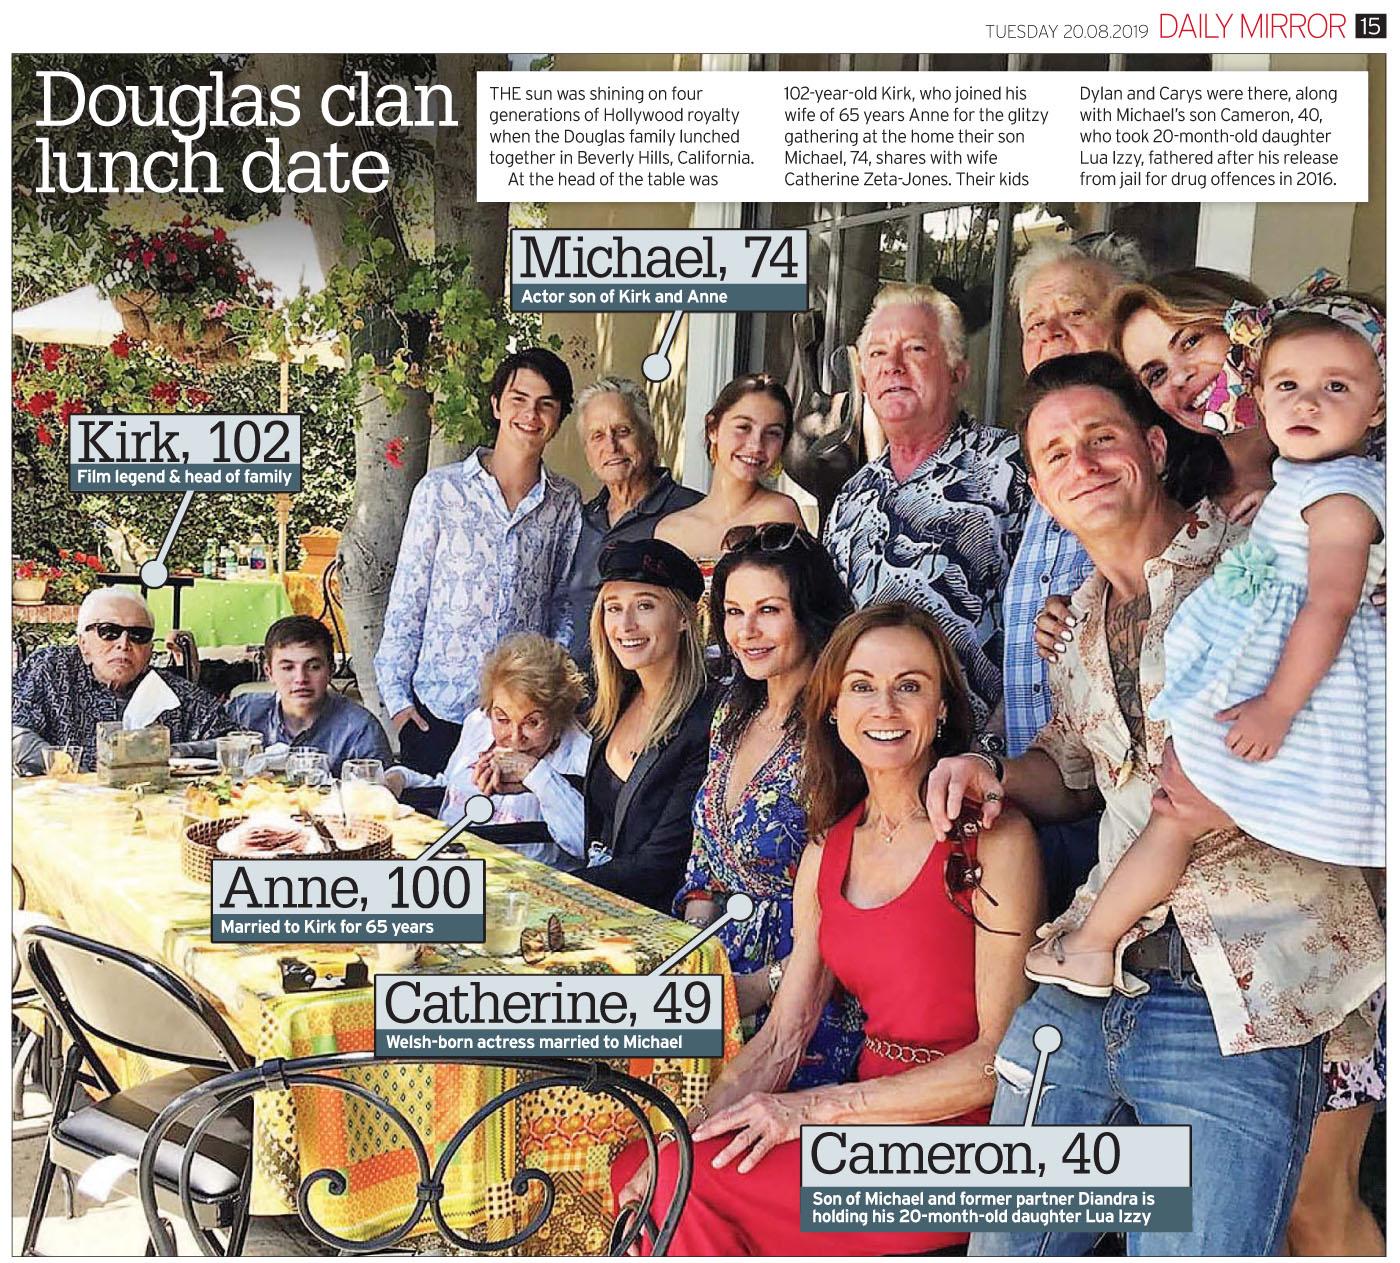 Daily_Mirror_August_20_2019_Douglas.jpg